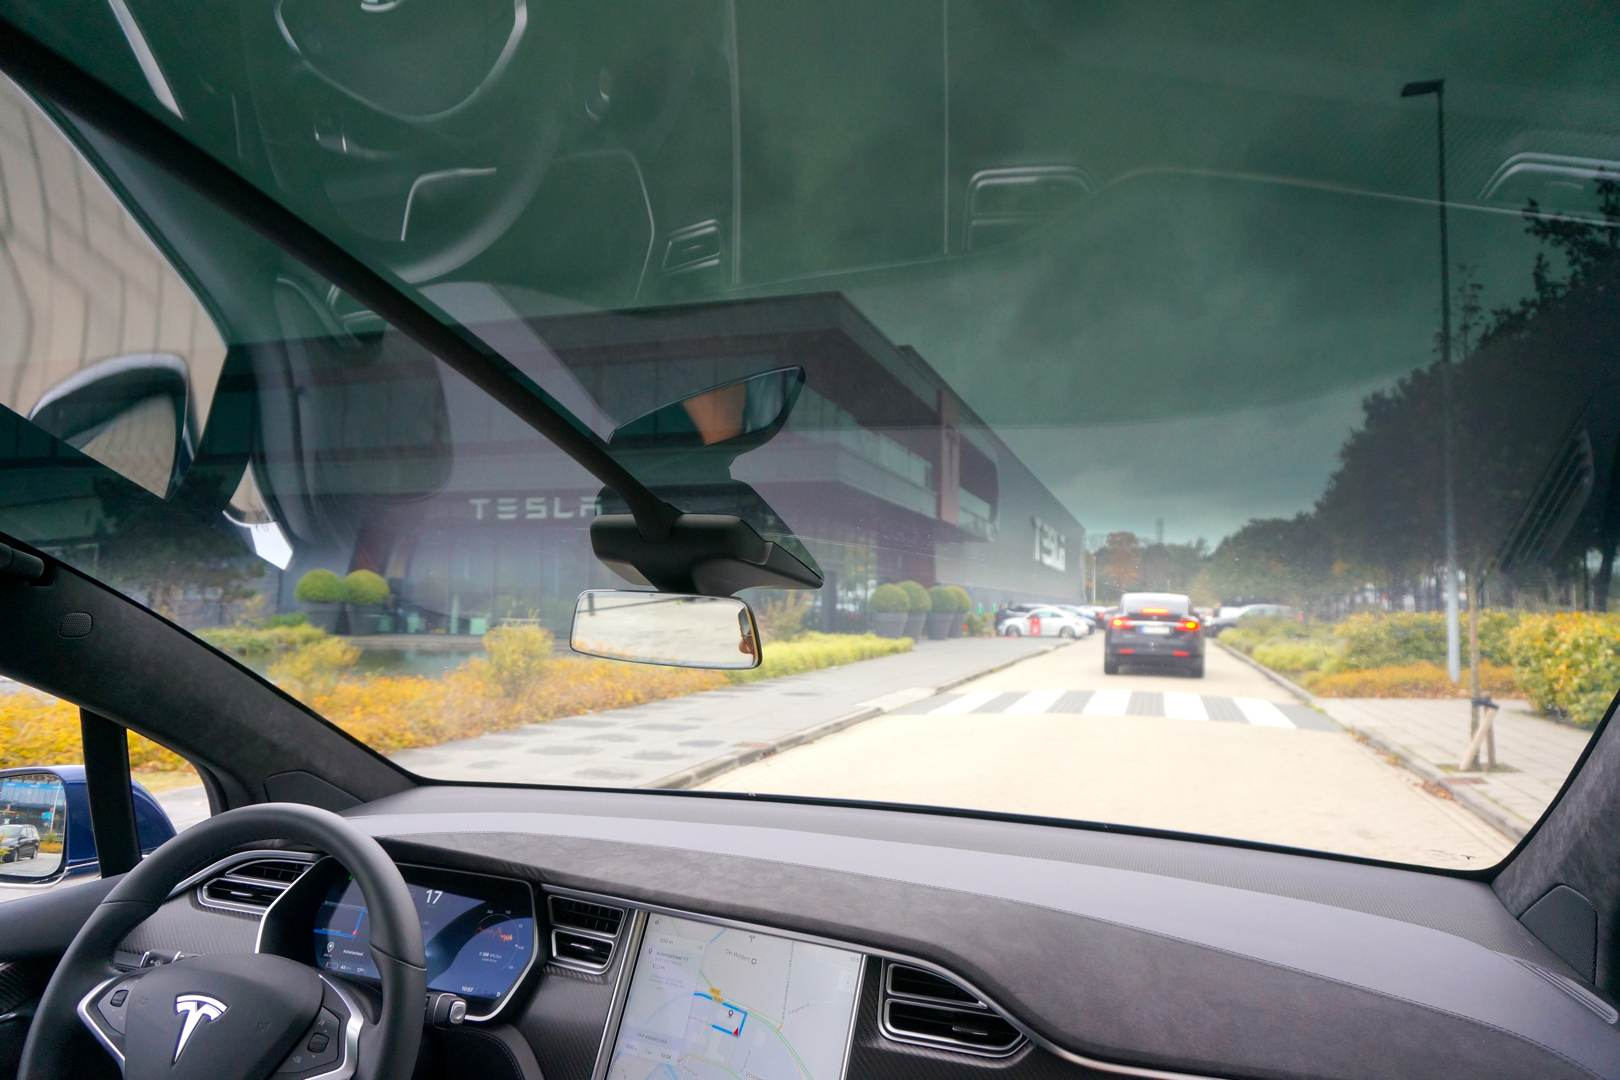 Tesla_Tilburg_Factory_Tour_Ankunft